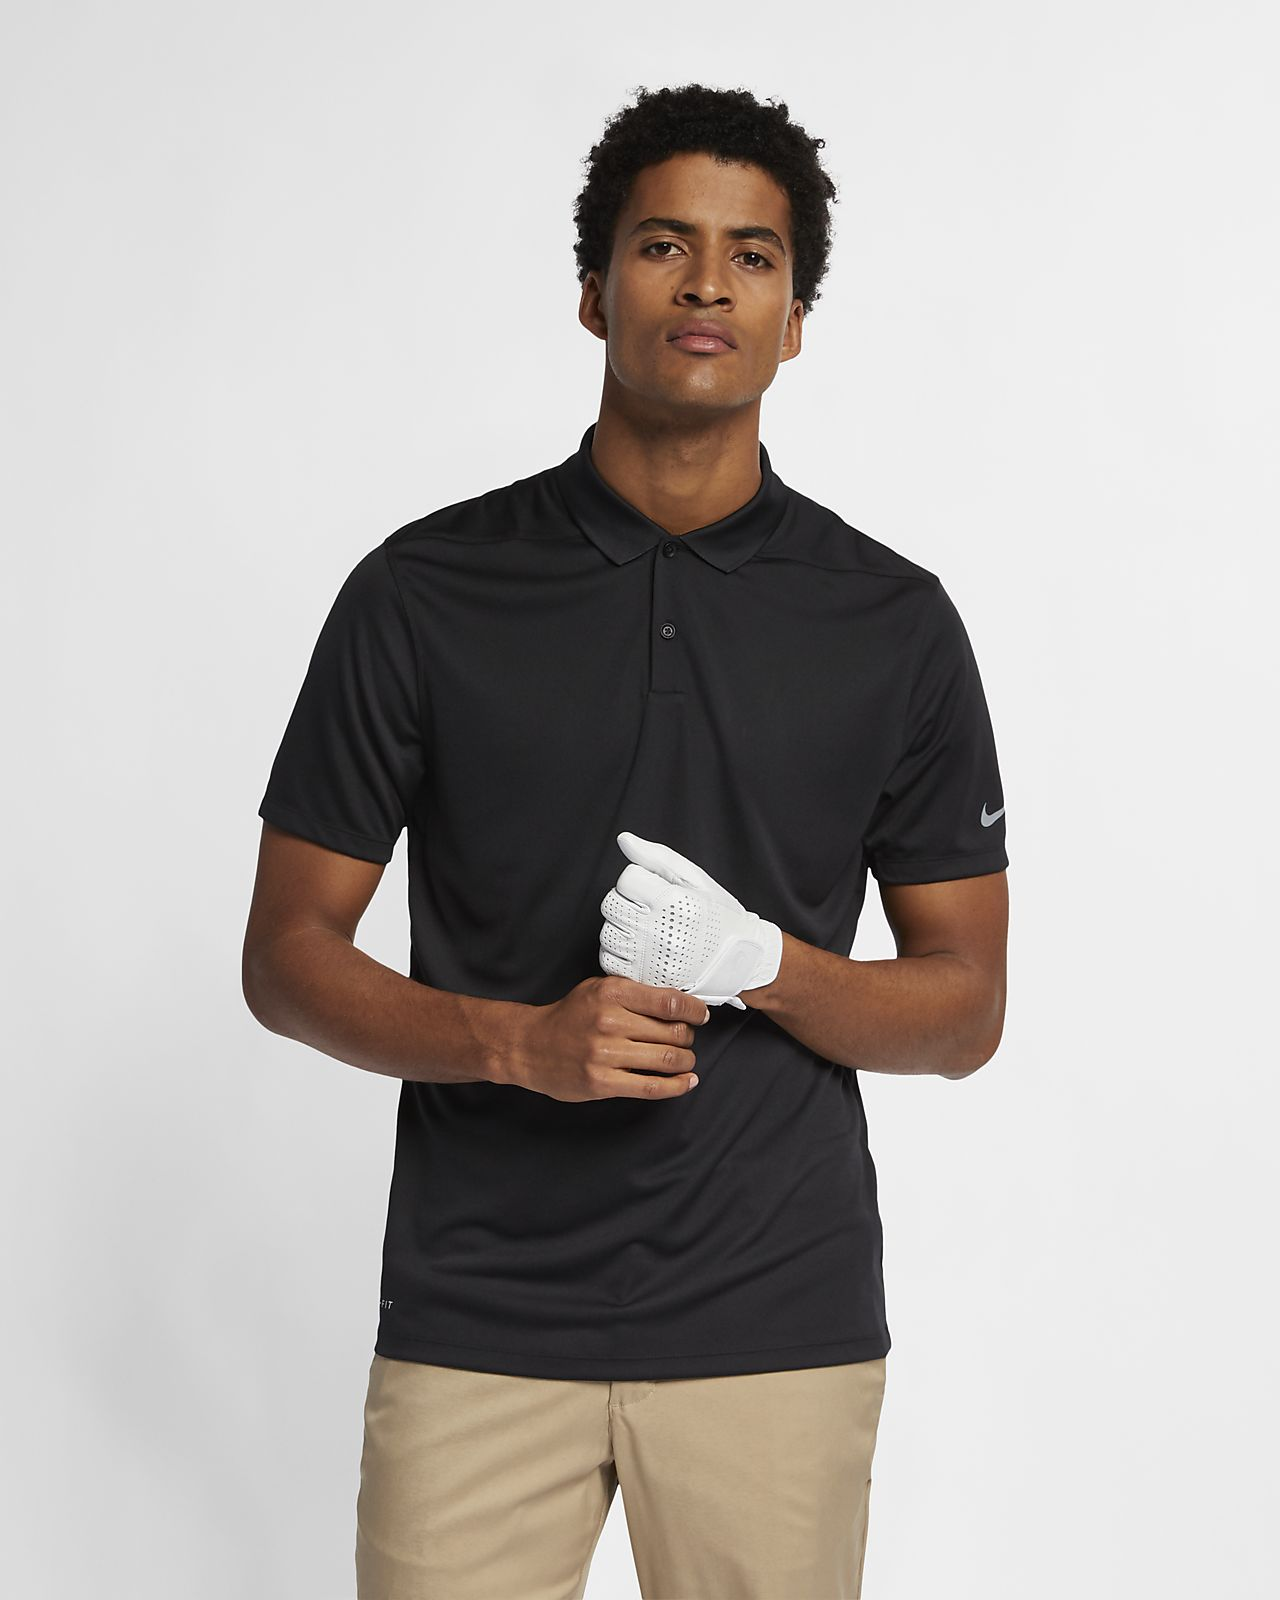 Polo de golf para hombre Nike Dri-FIT Victory